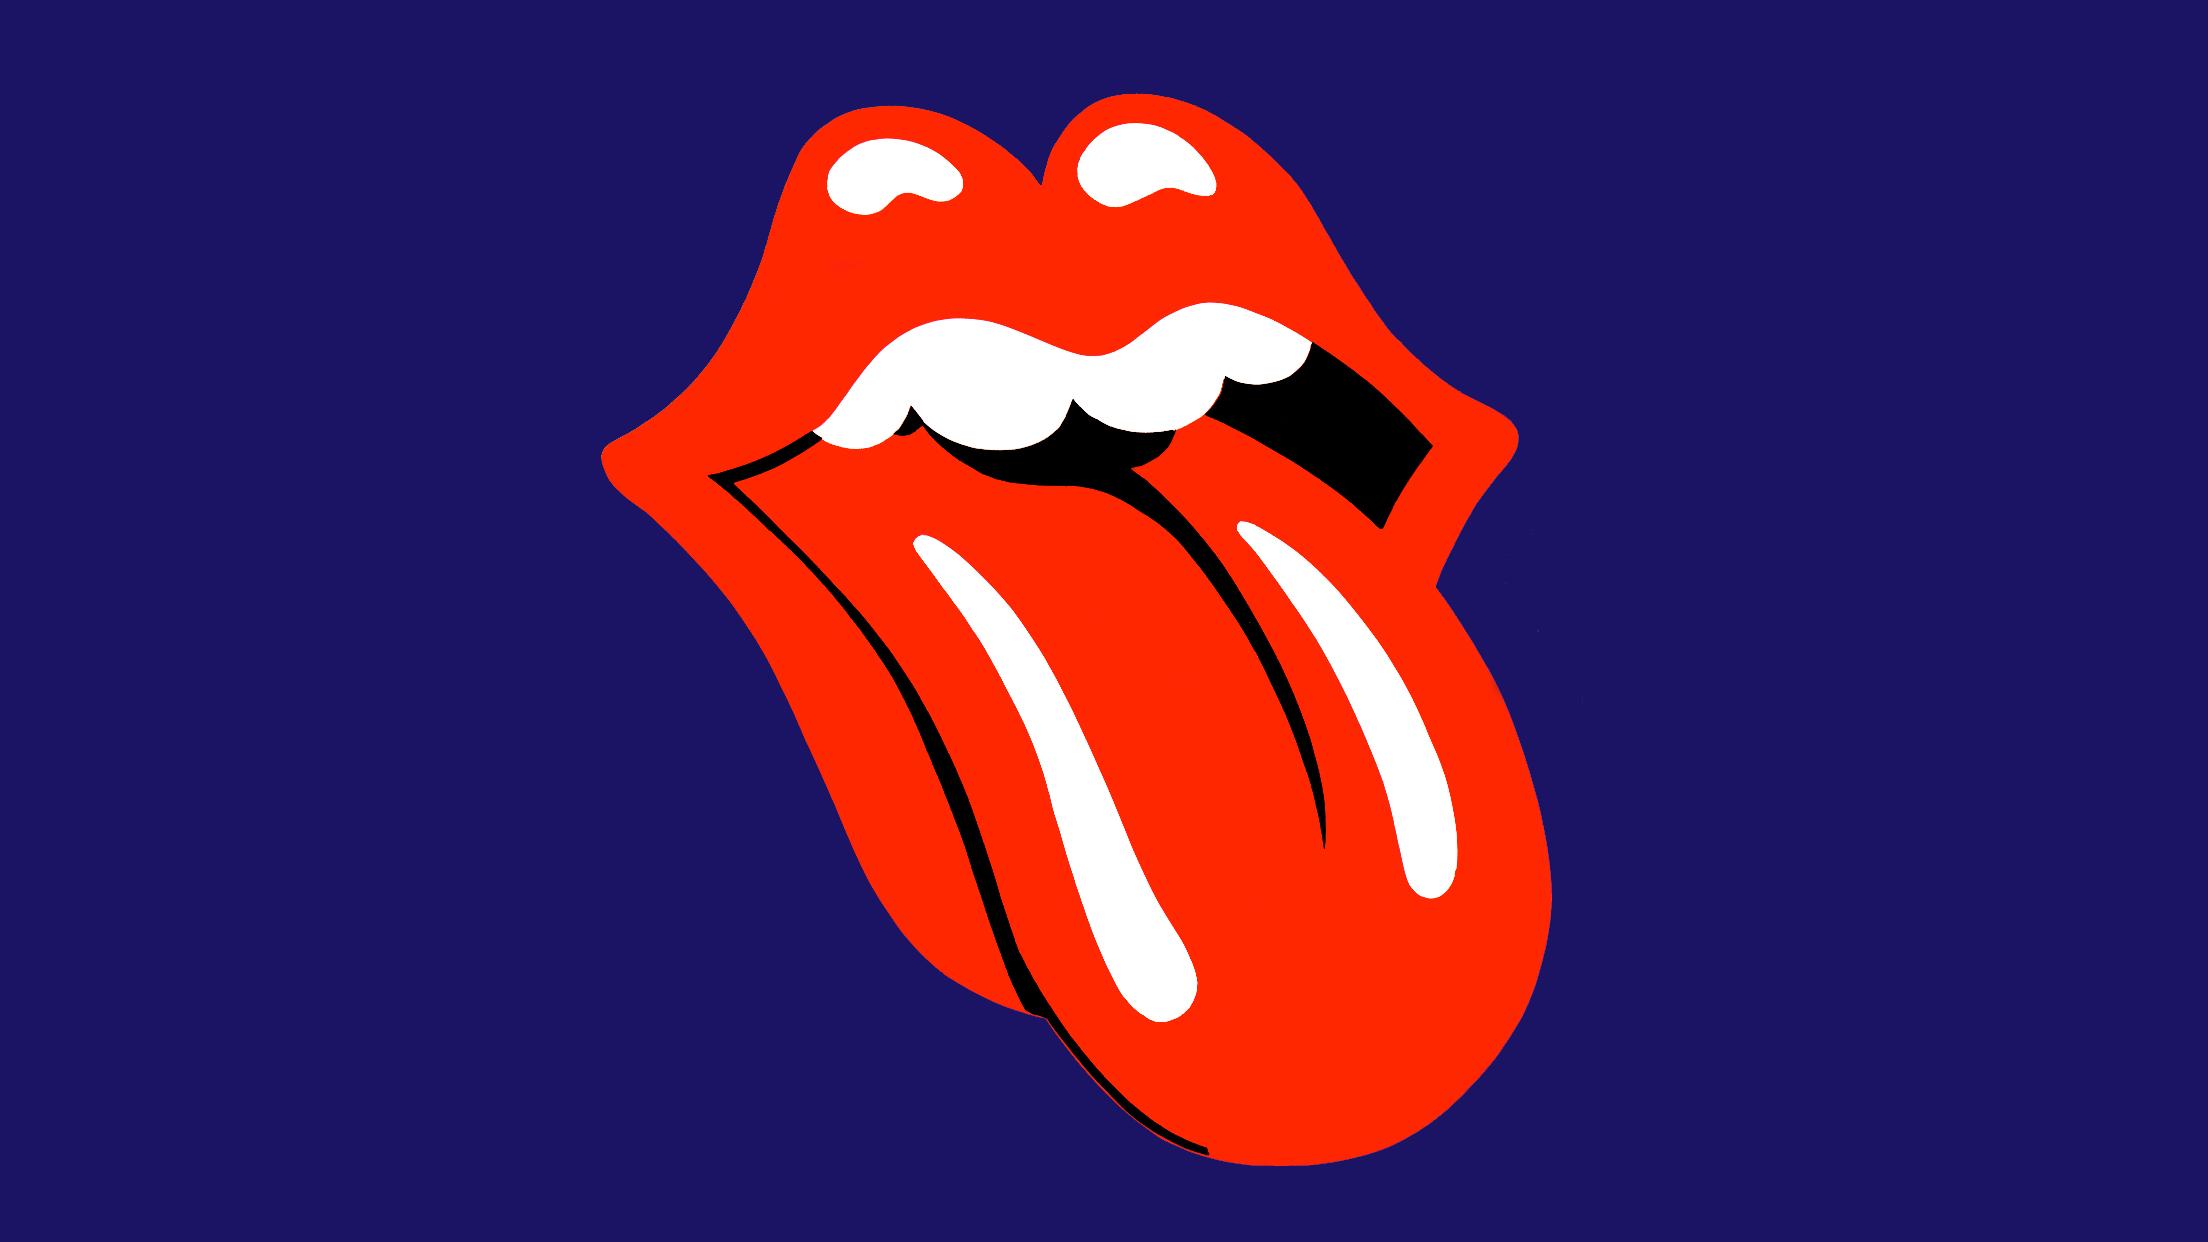 The Rolling Stones Computer Wallpapers Desktop Backgrounds 2208x1242